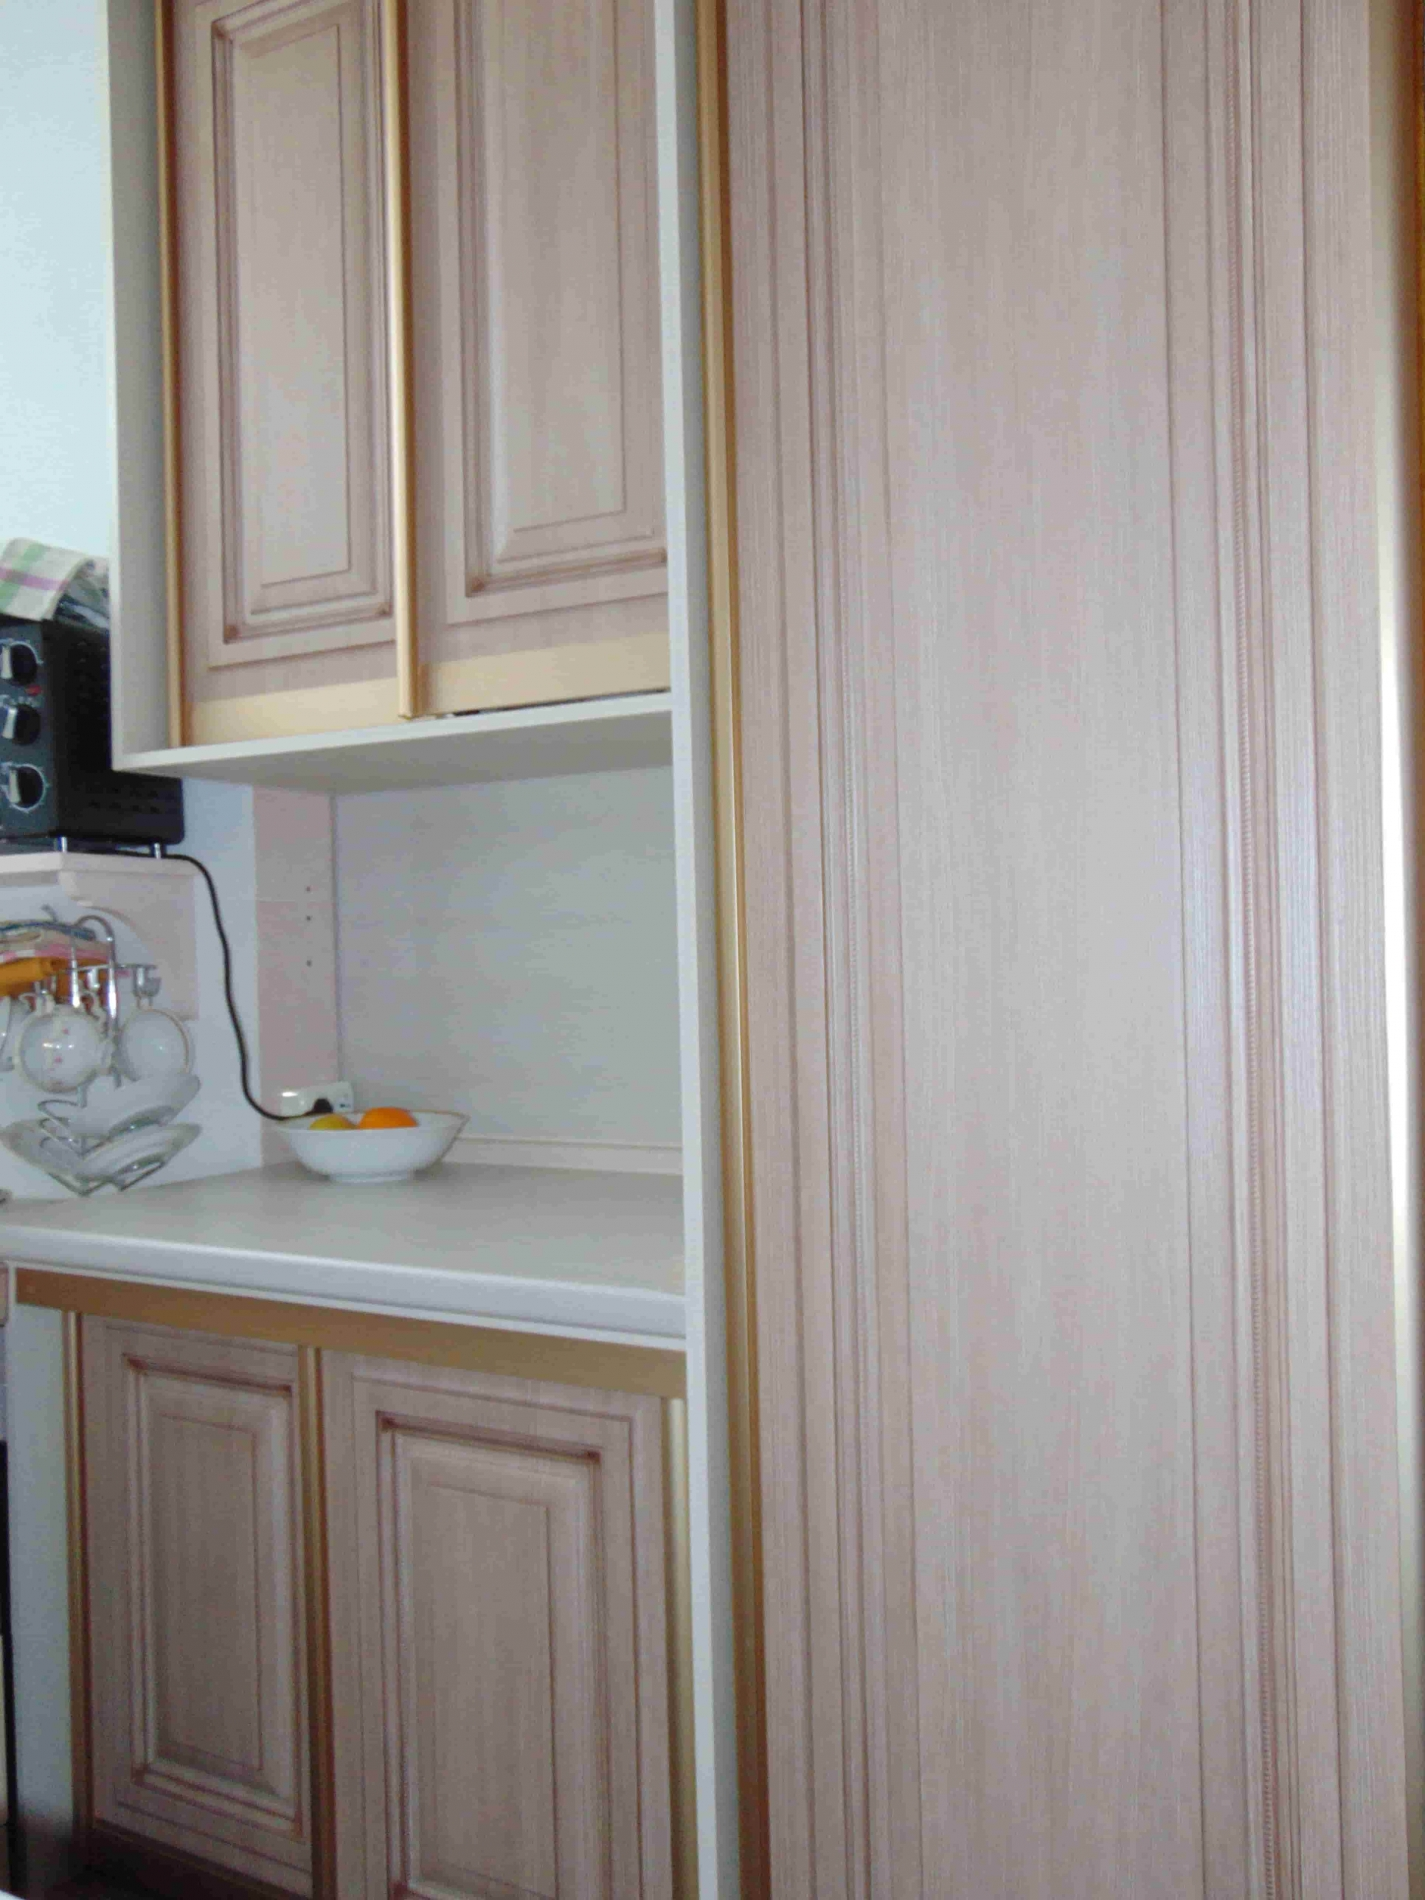 Кухонный гарнитур фасады купе